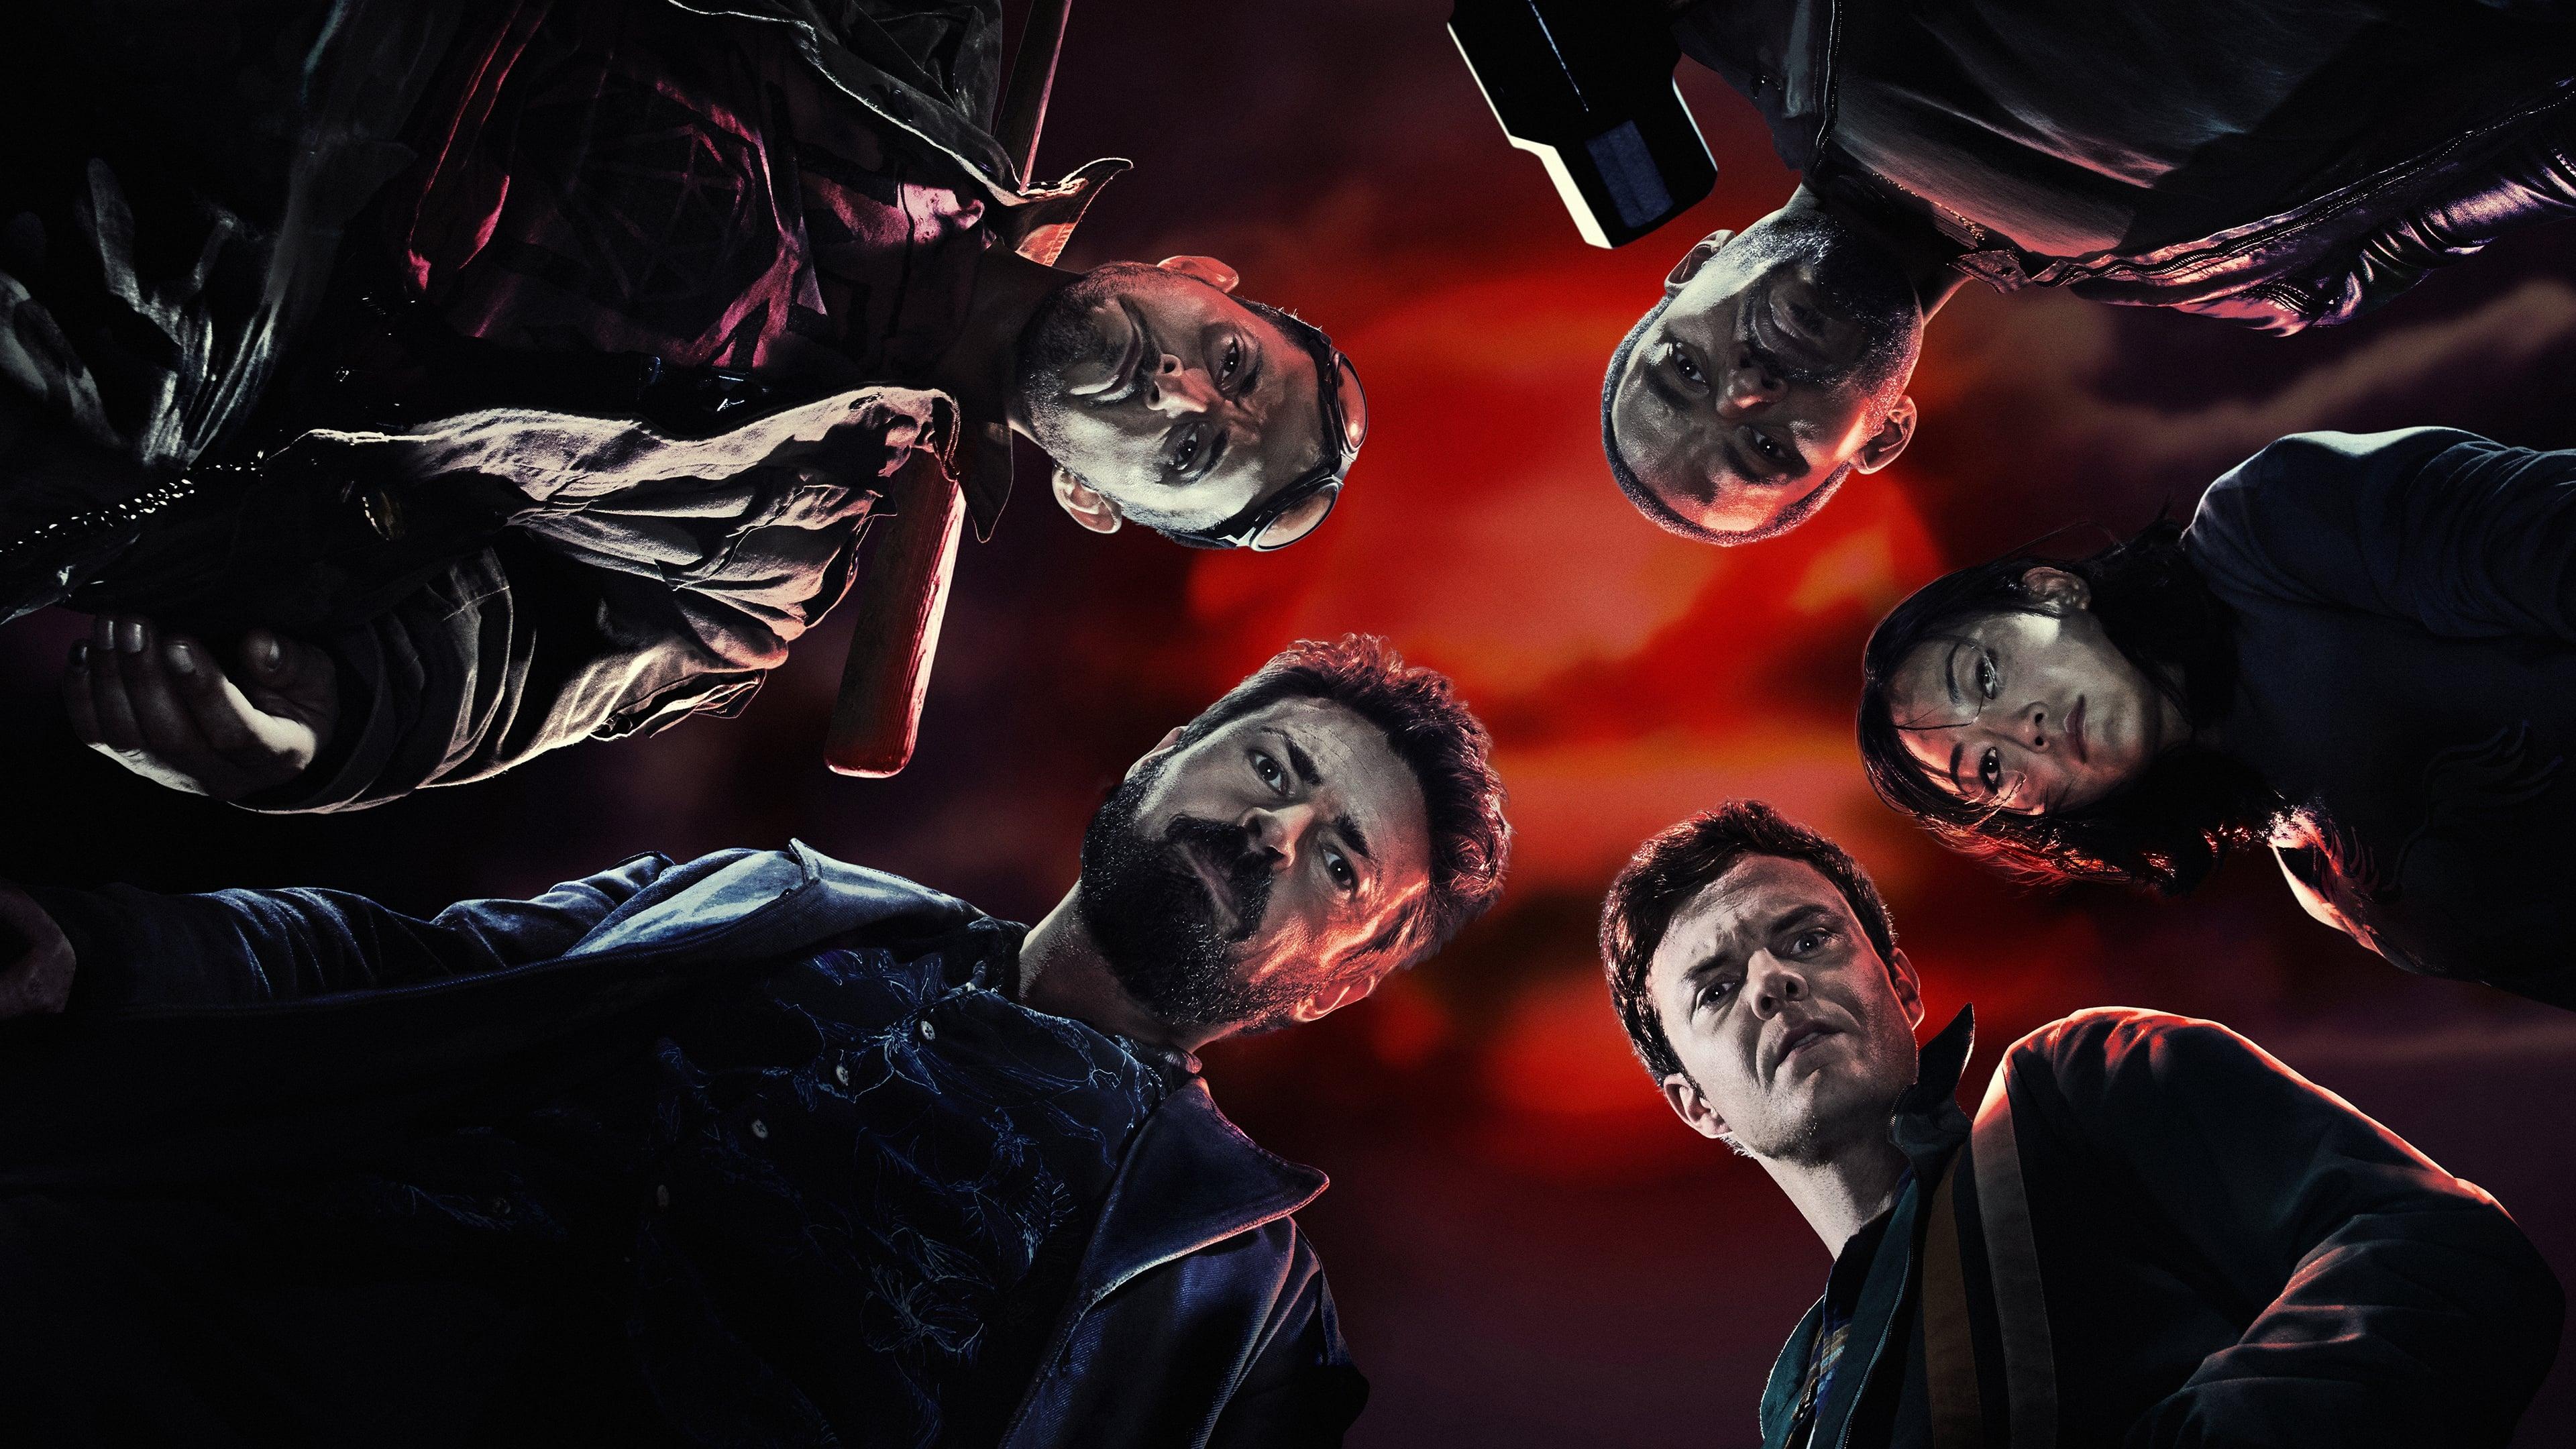 Tweede seizoen The Boys in september in première